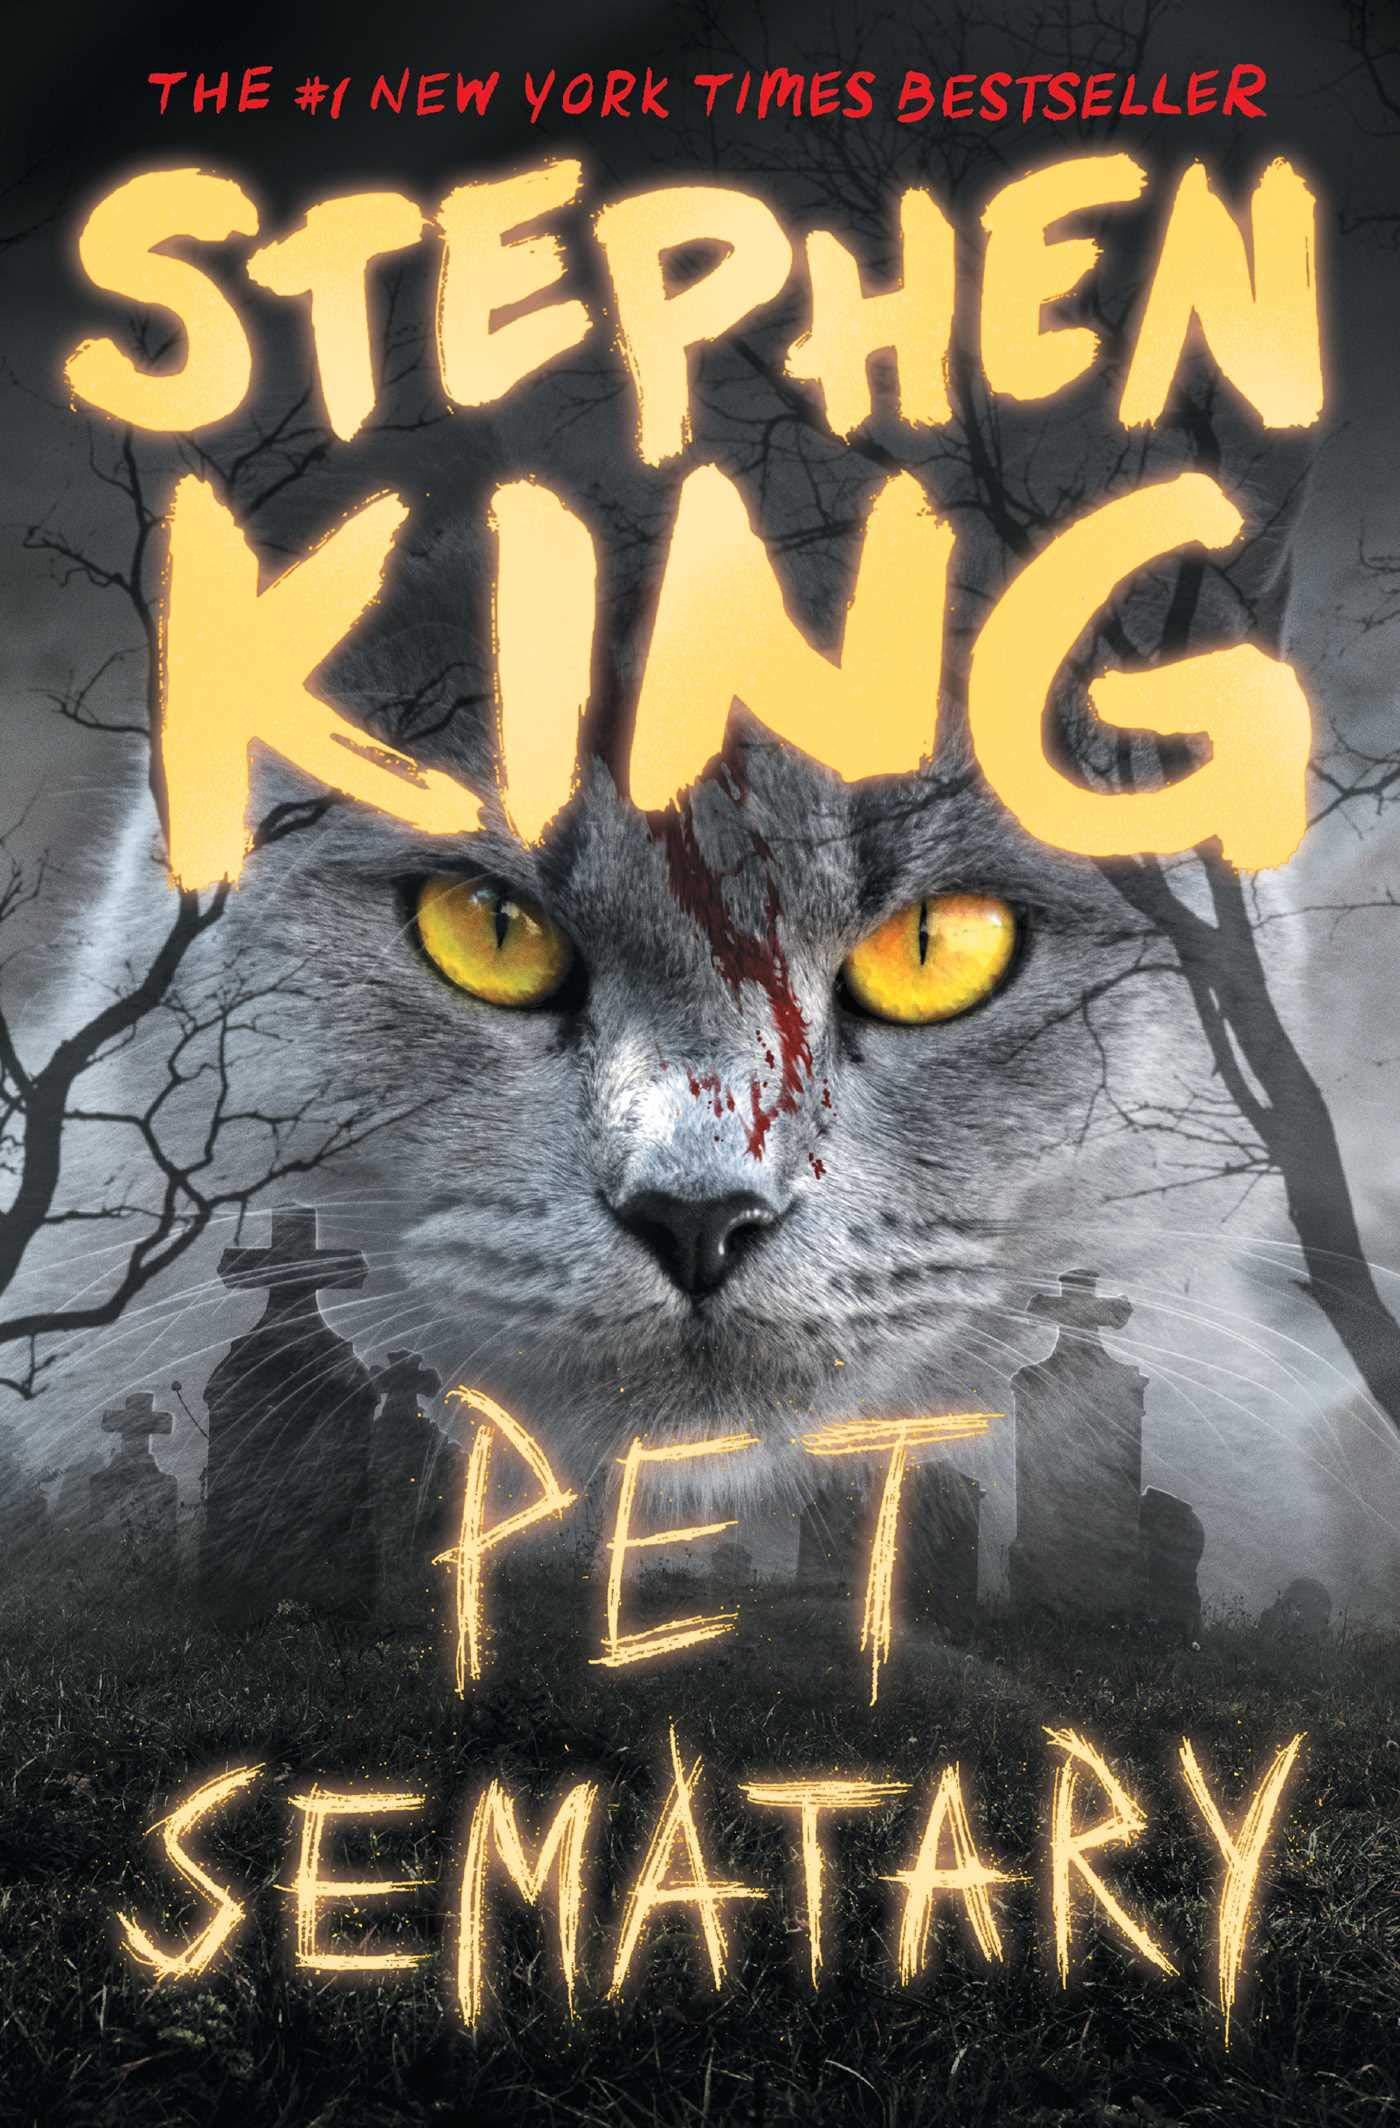 Pet Sematary: King, Stephen: 9781982112394: Amazon.com: Books